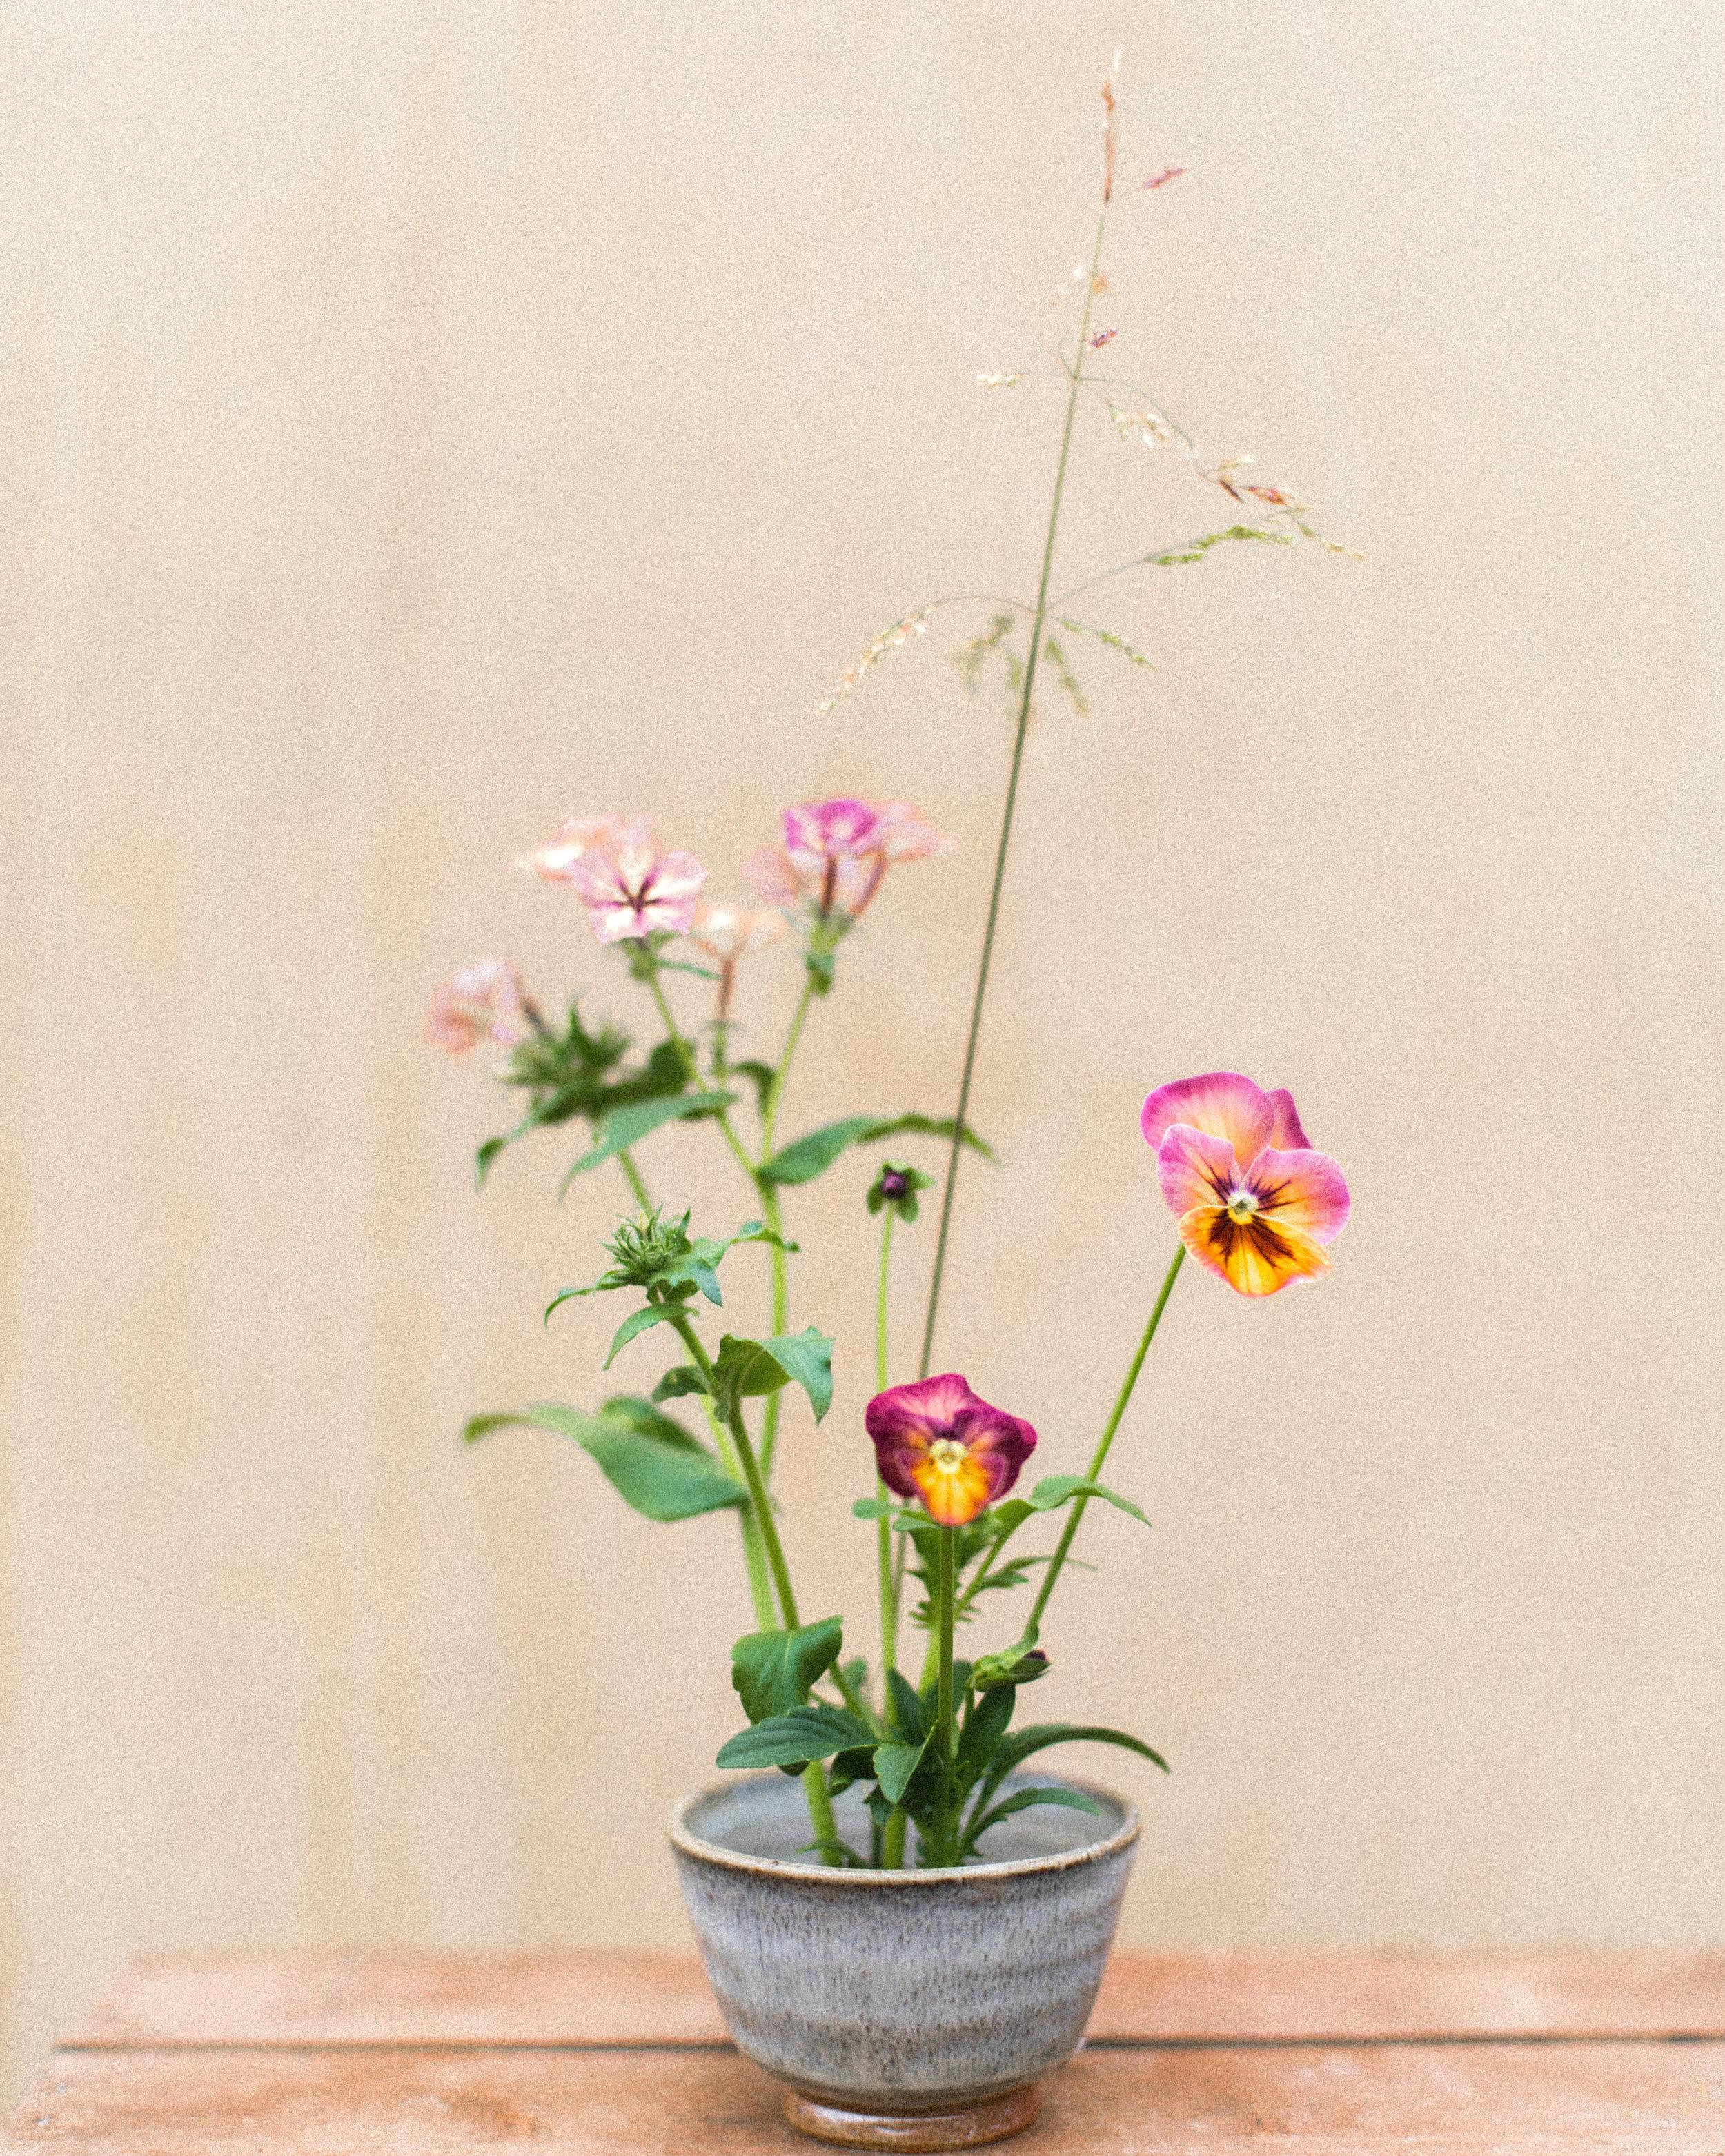 Floret seed viola